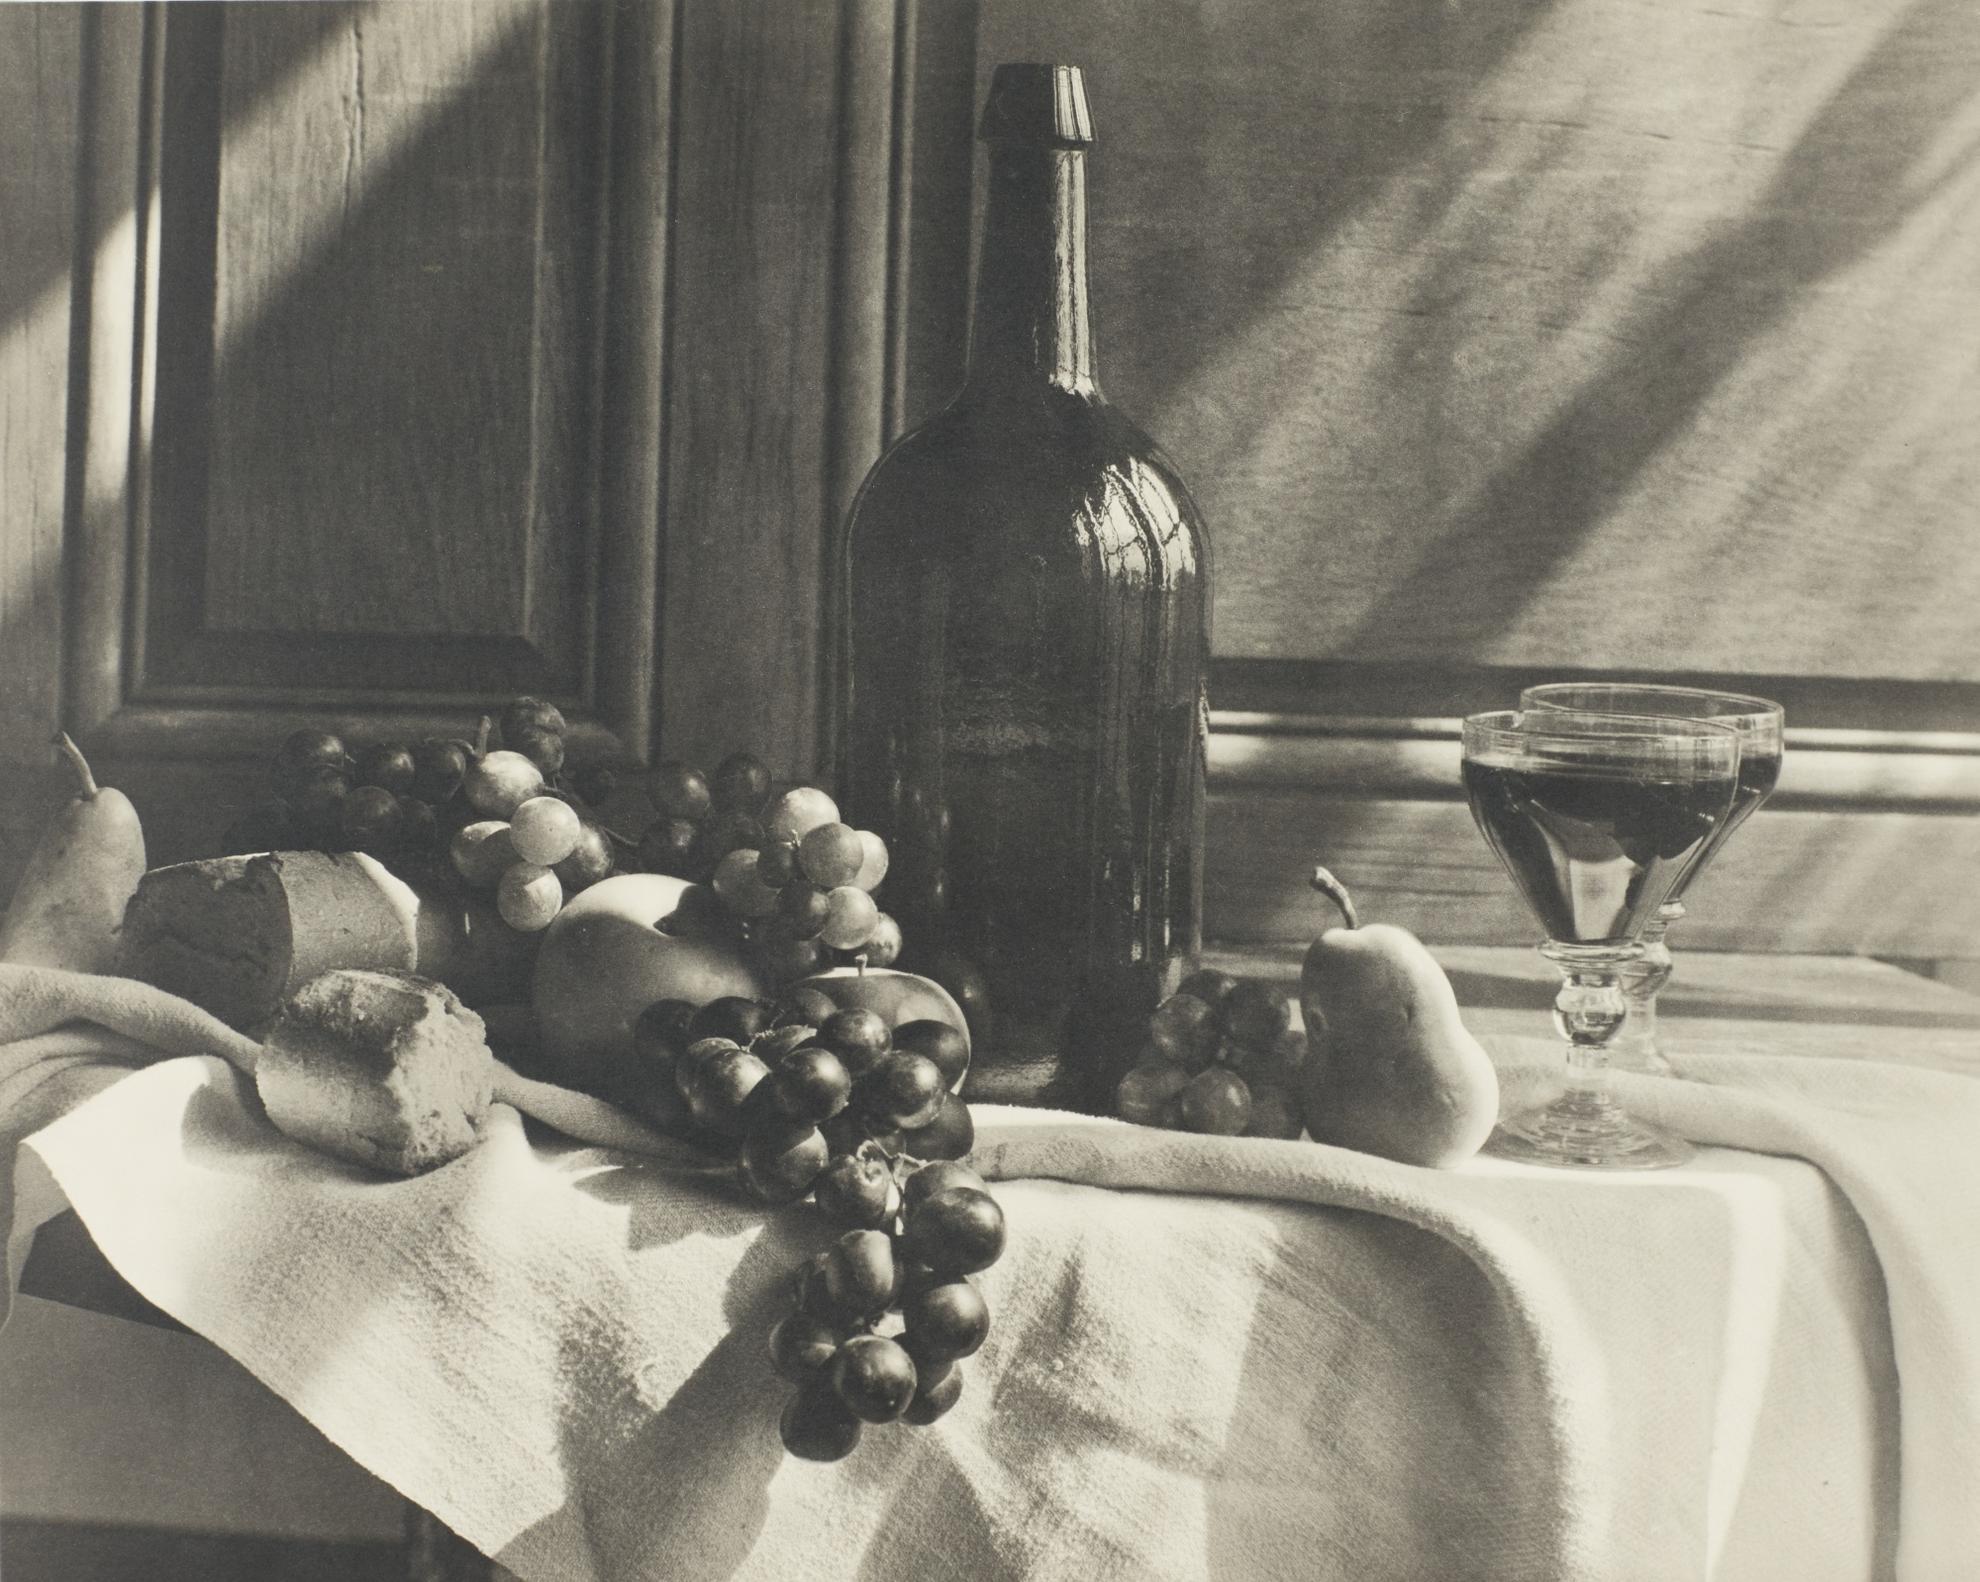 Horst P. Horst-Still Life - Wine Bottle, Ny, 1949-1949